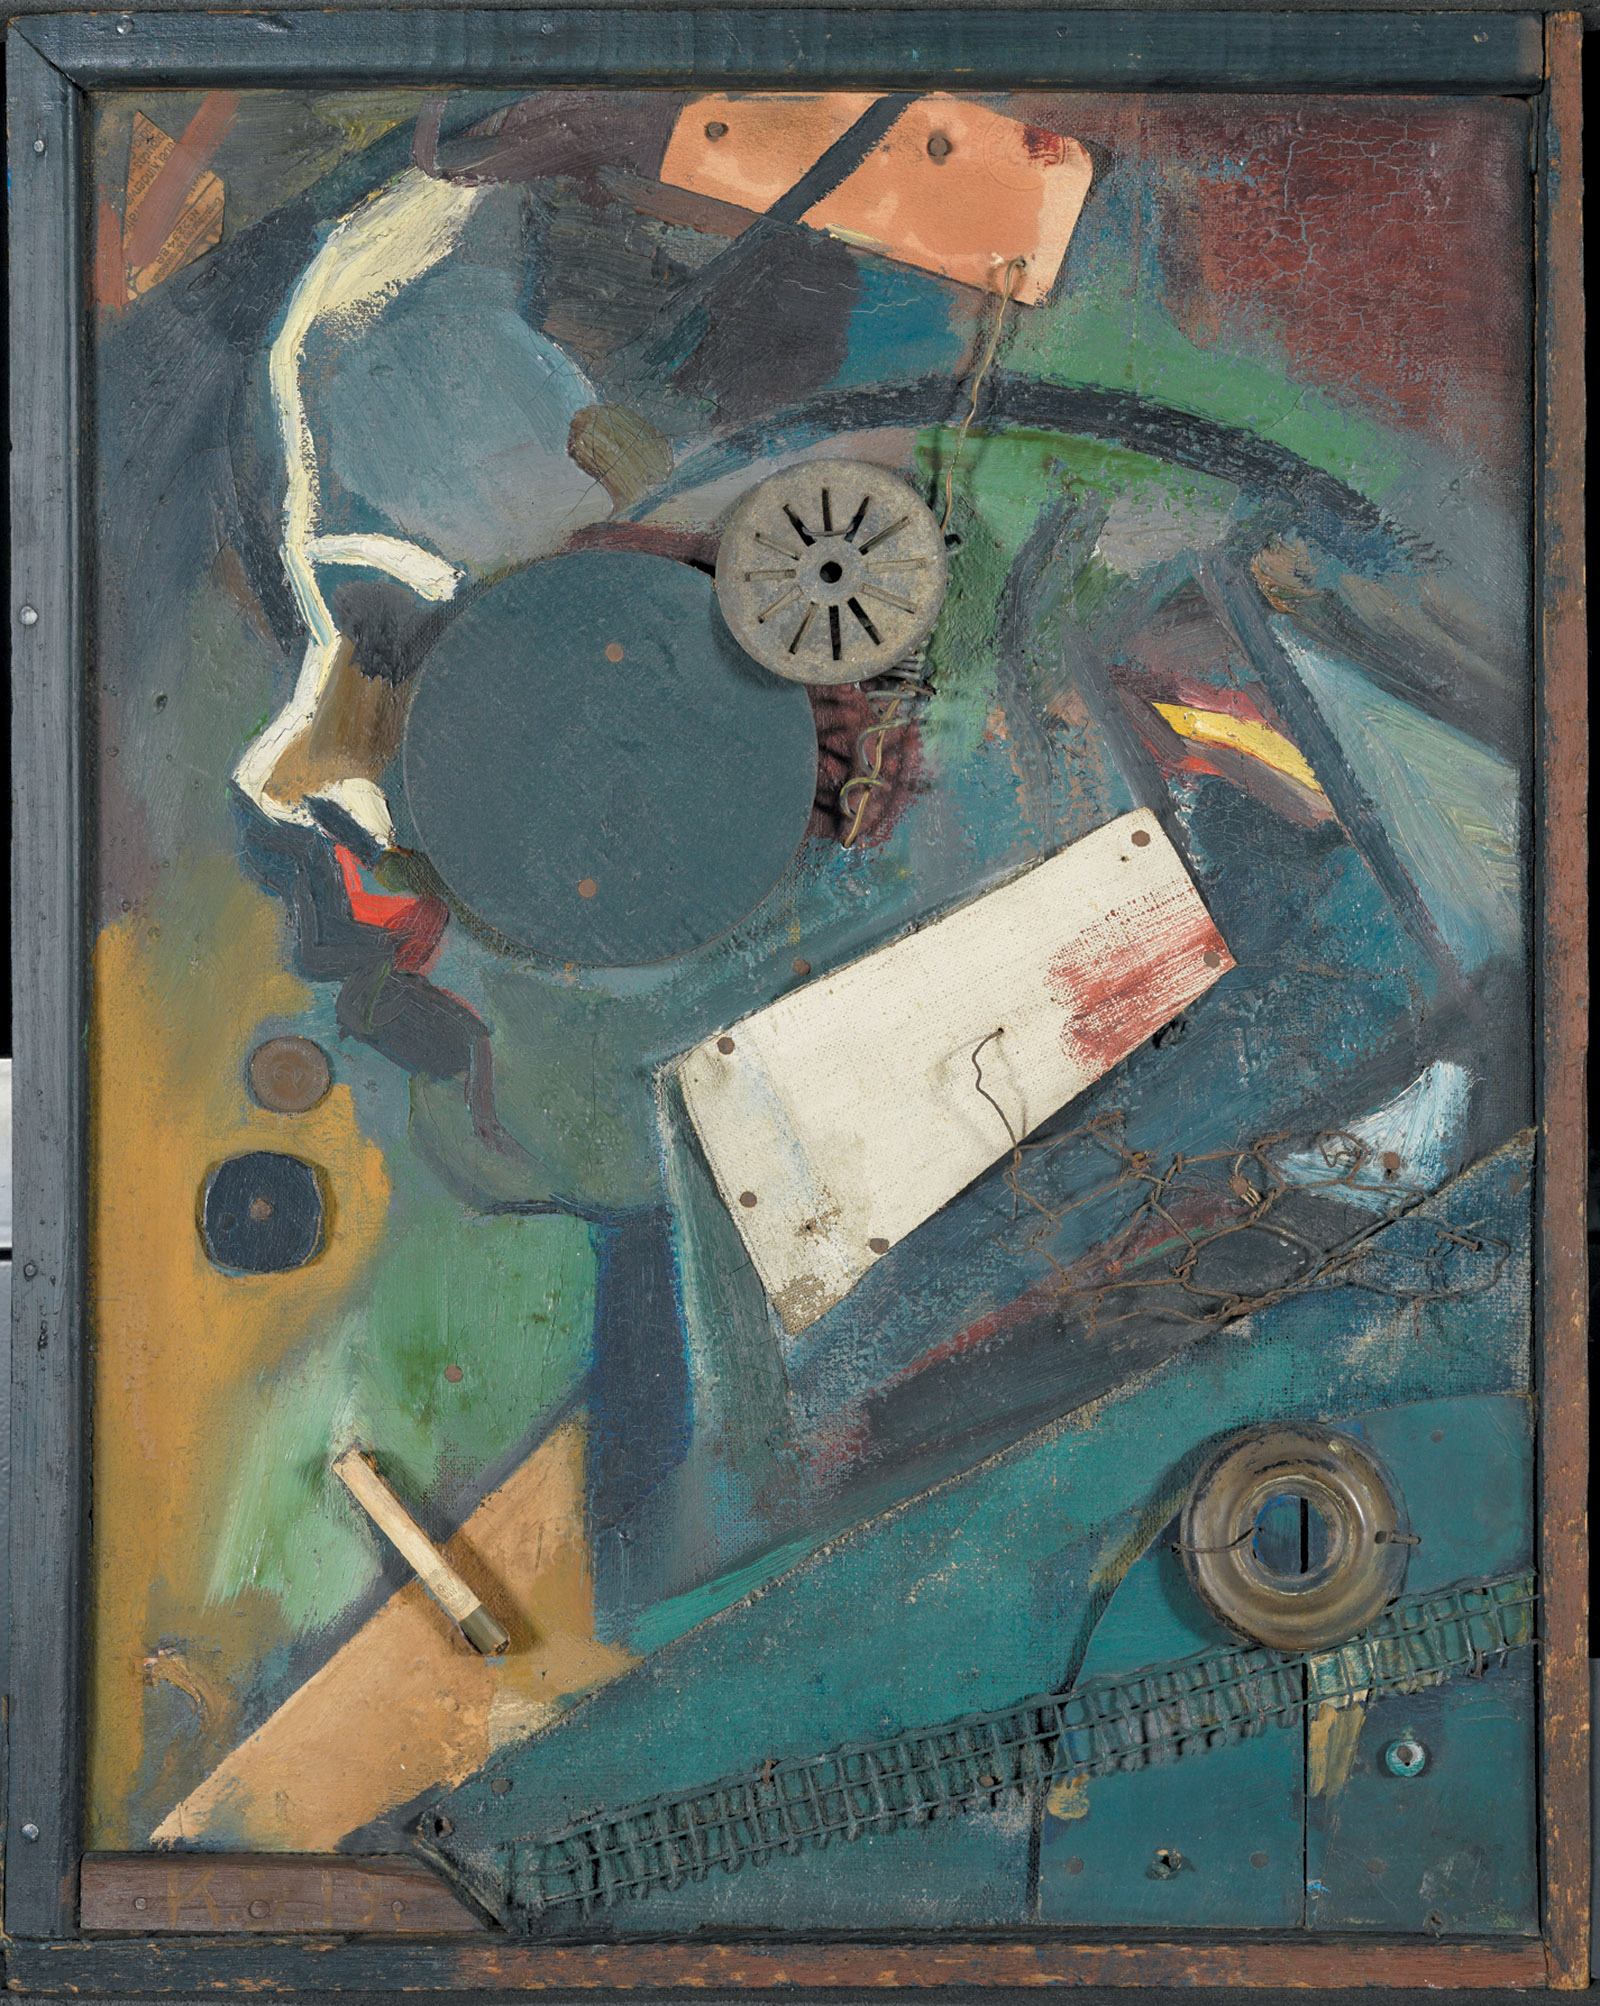 Kurt Schwitters: Merzbild 1A (The Psychiatrist), 1919